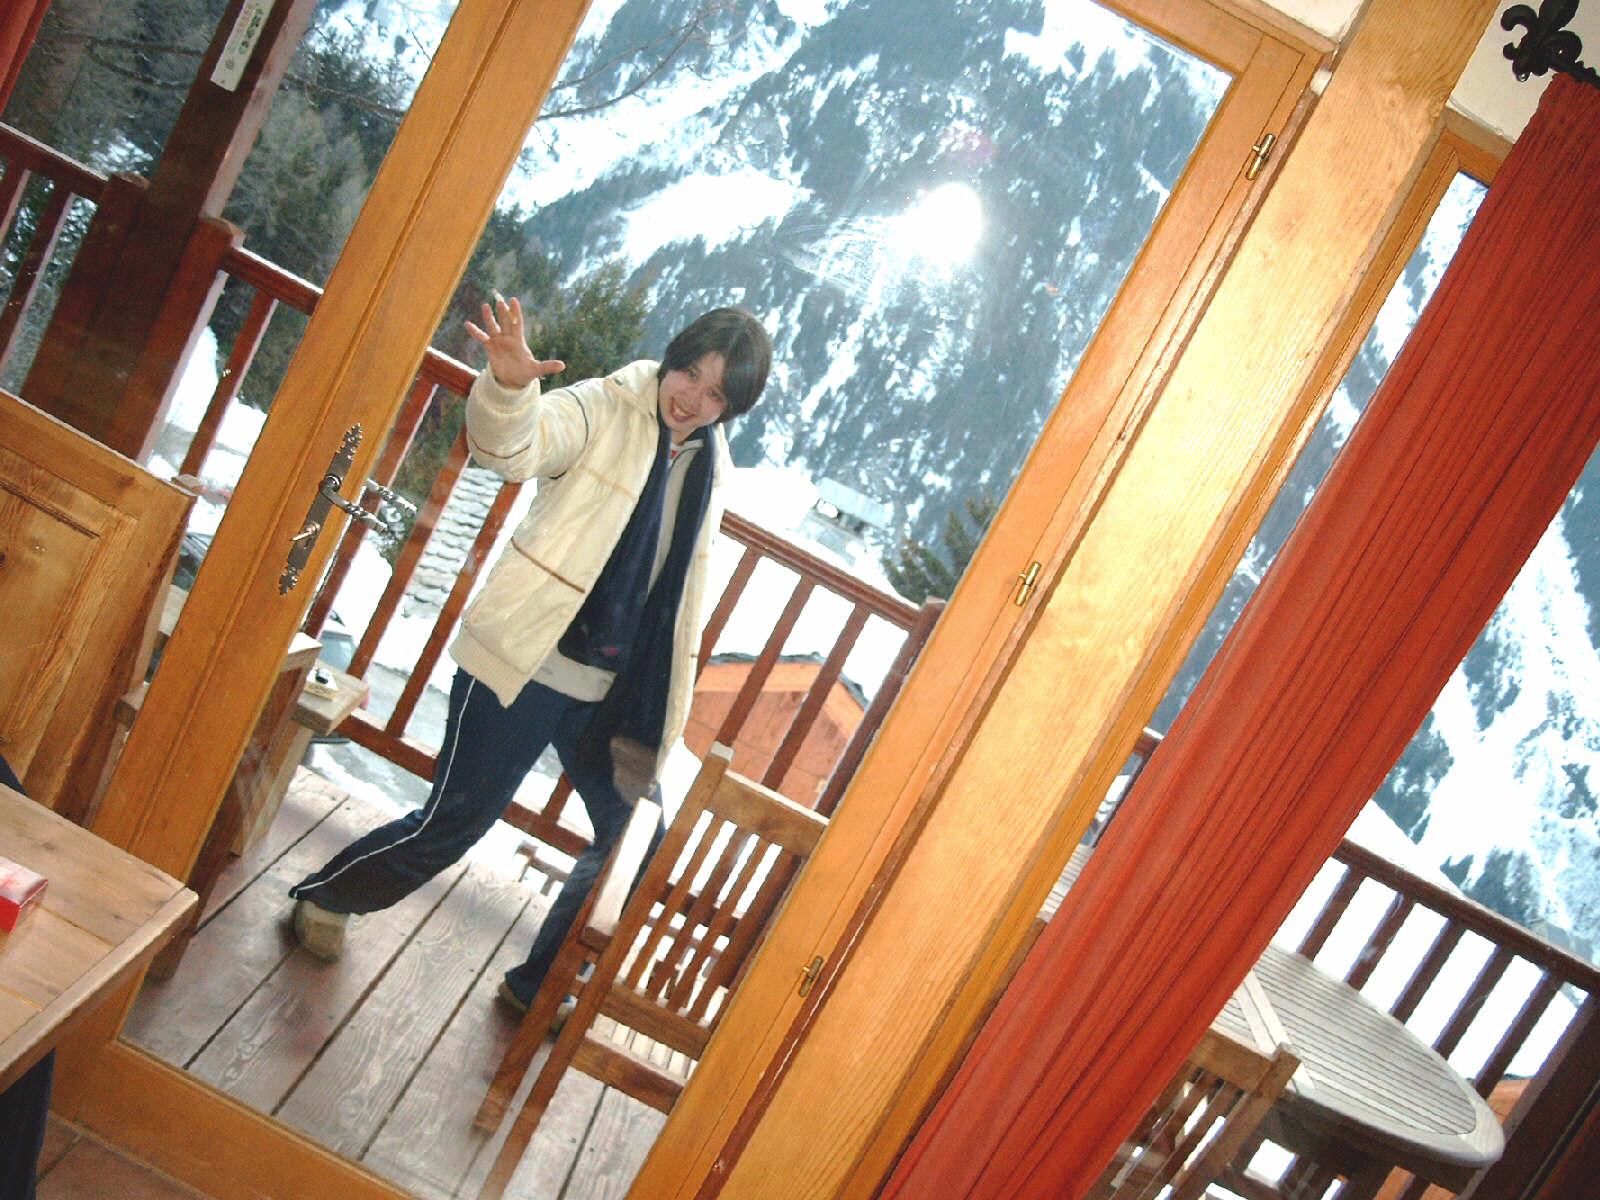 sfg_selma_swingt_op_balkon.jpg